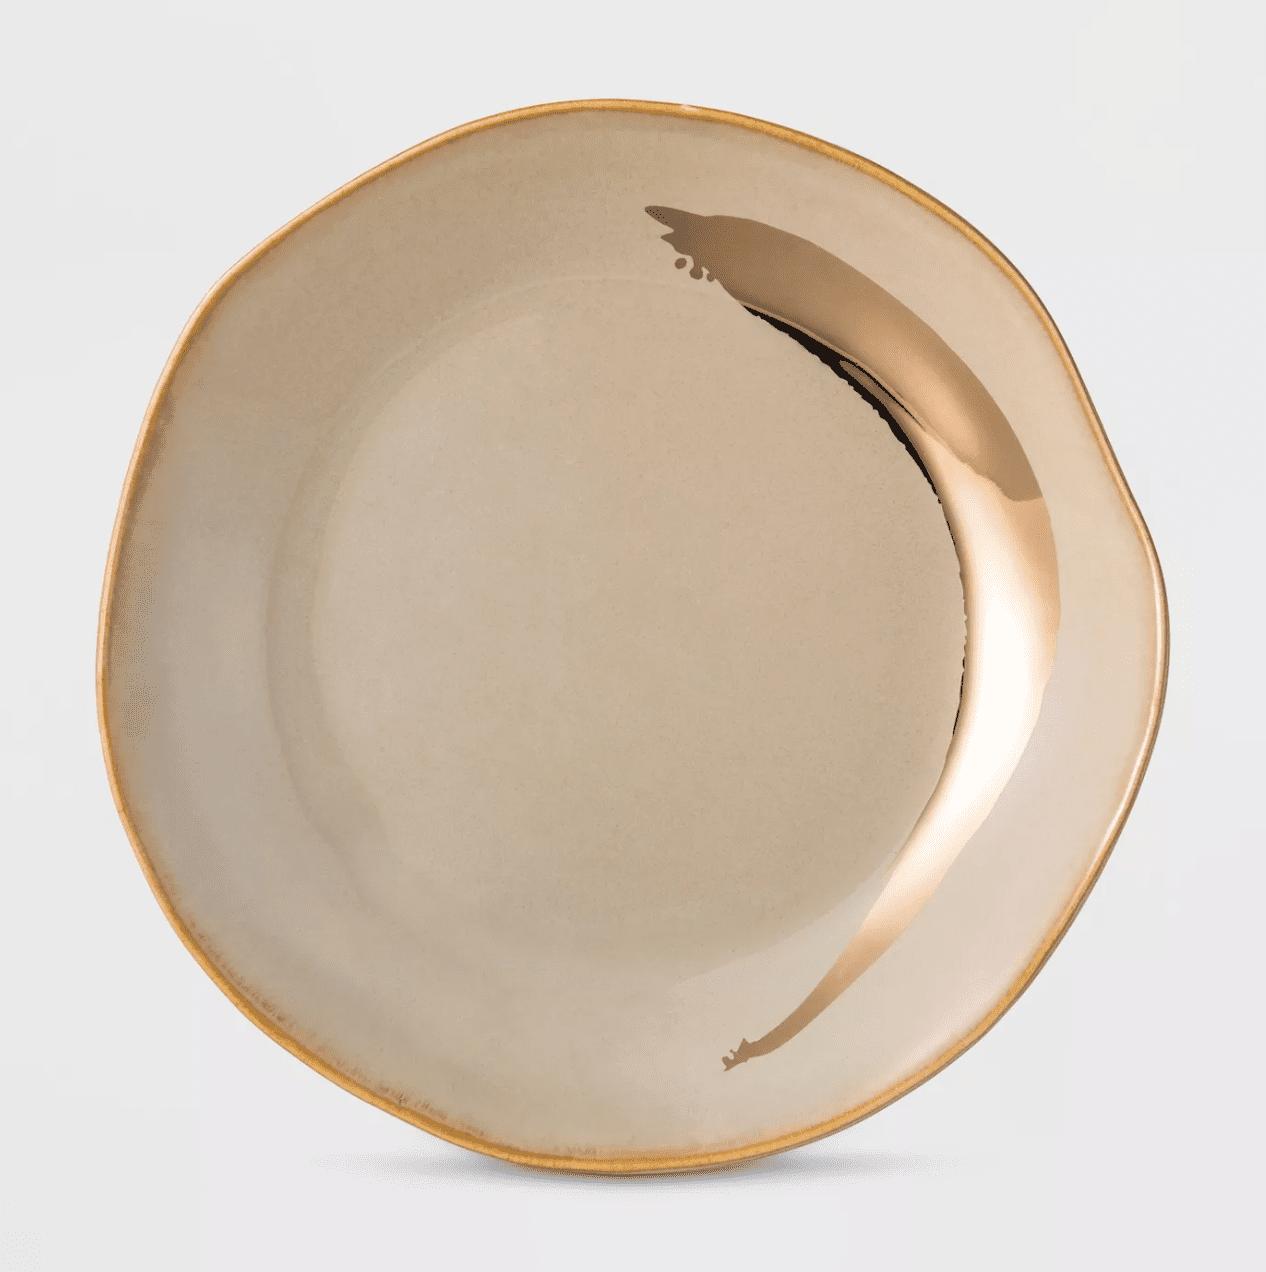 Cravings by Chrissy Teigen Stoneware Dessert Plate